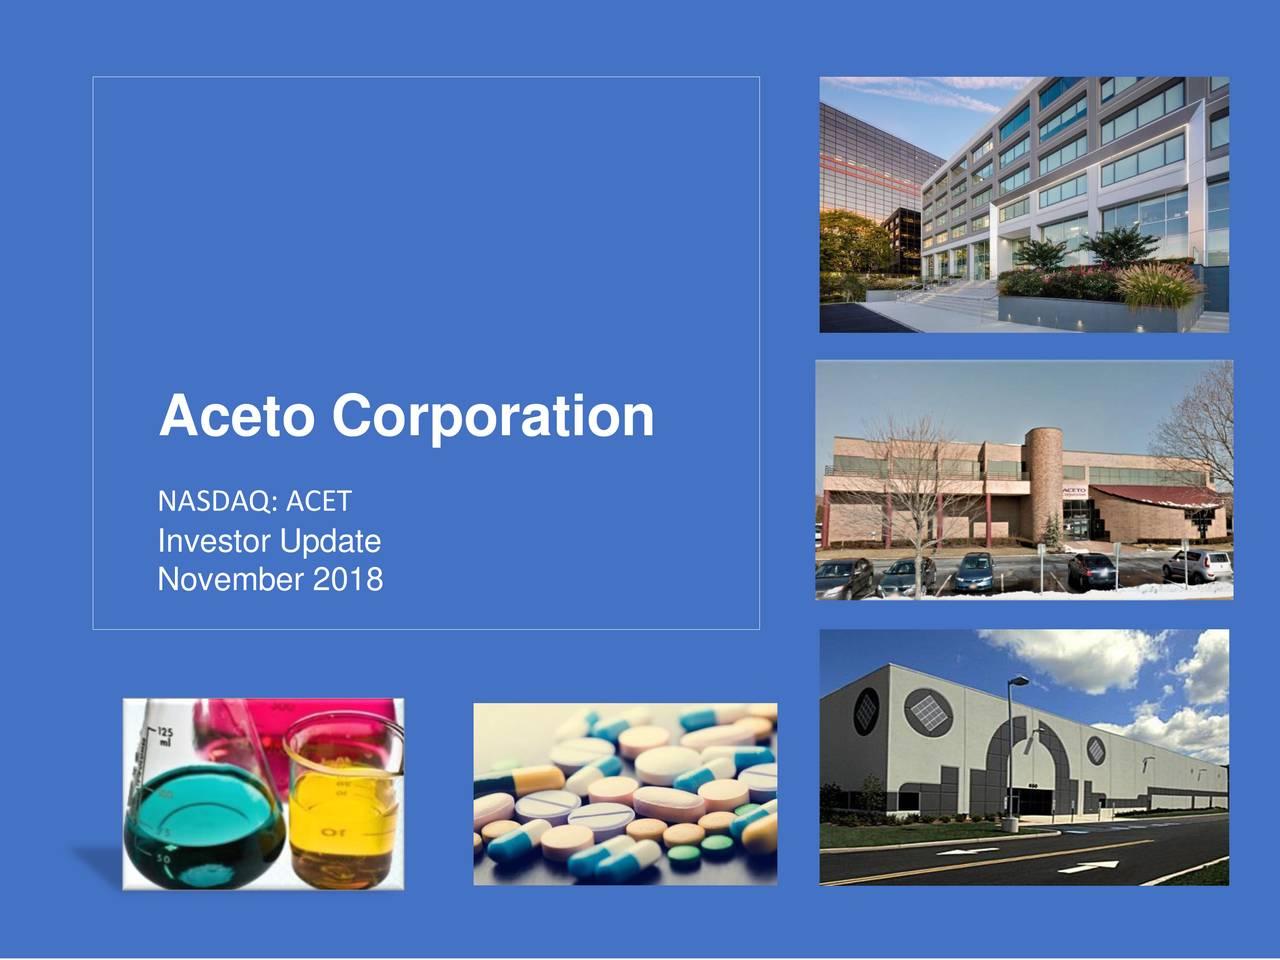 NASDAQ: ACET Investor Update November 2018